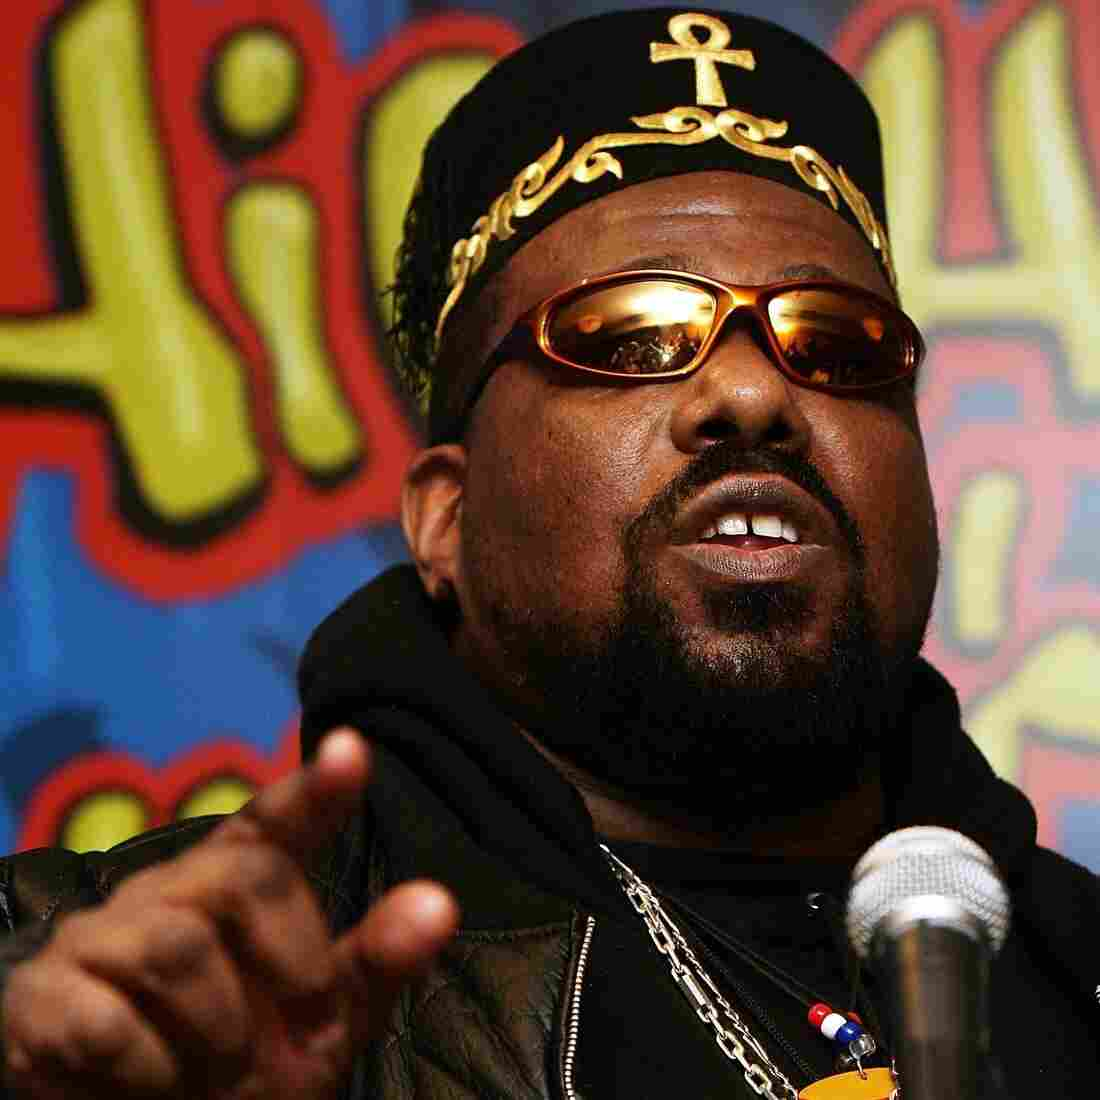 'Rebel Music': When Hip-Hop Met Islam